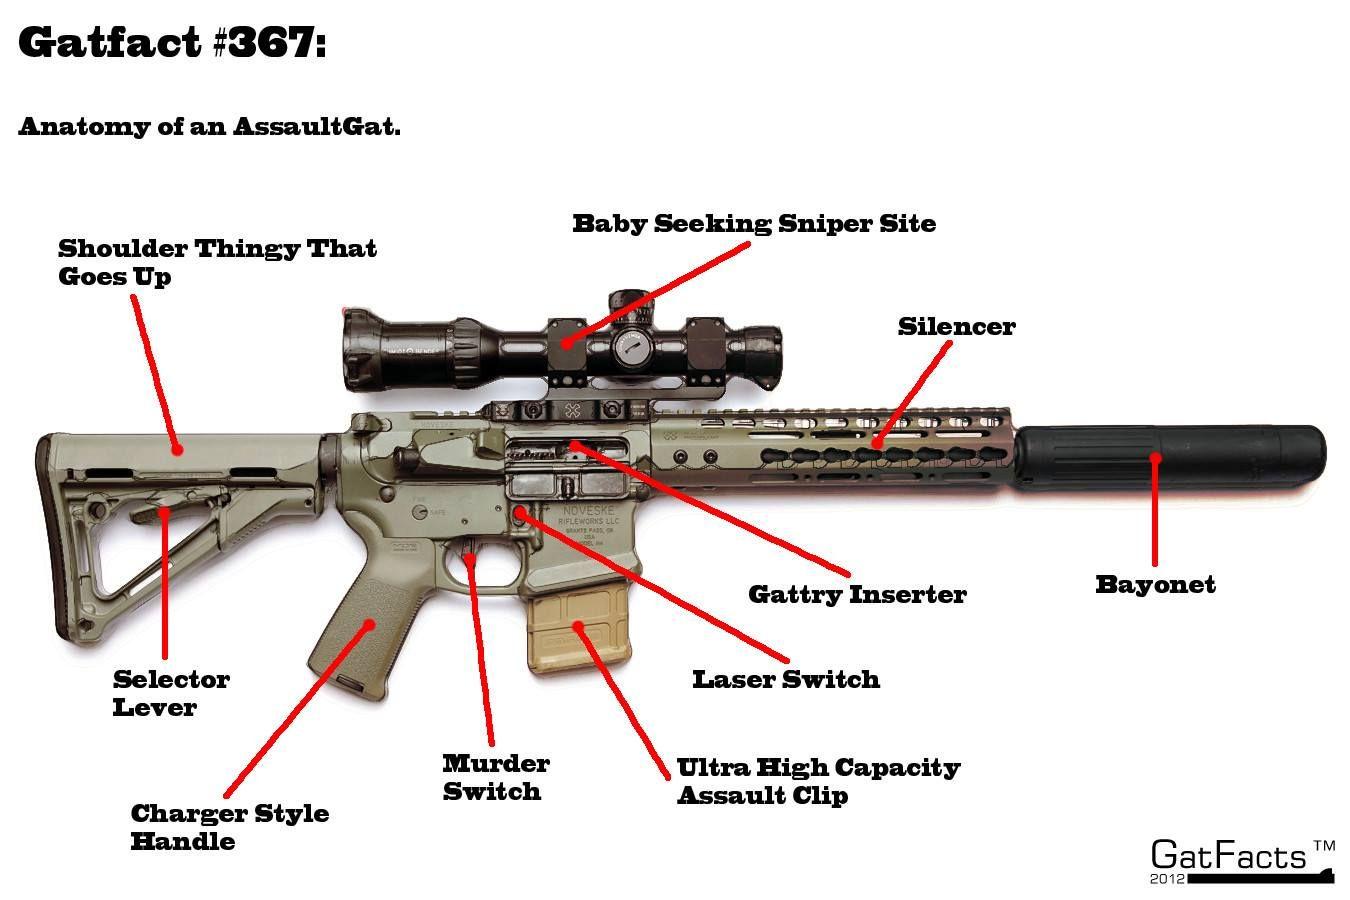 gun anatomy - Google Search | structural | Pinterest | Anatomy and Guns